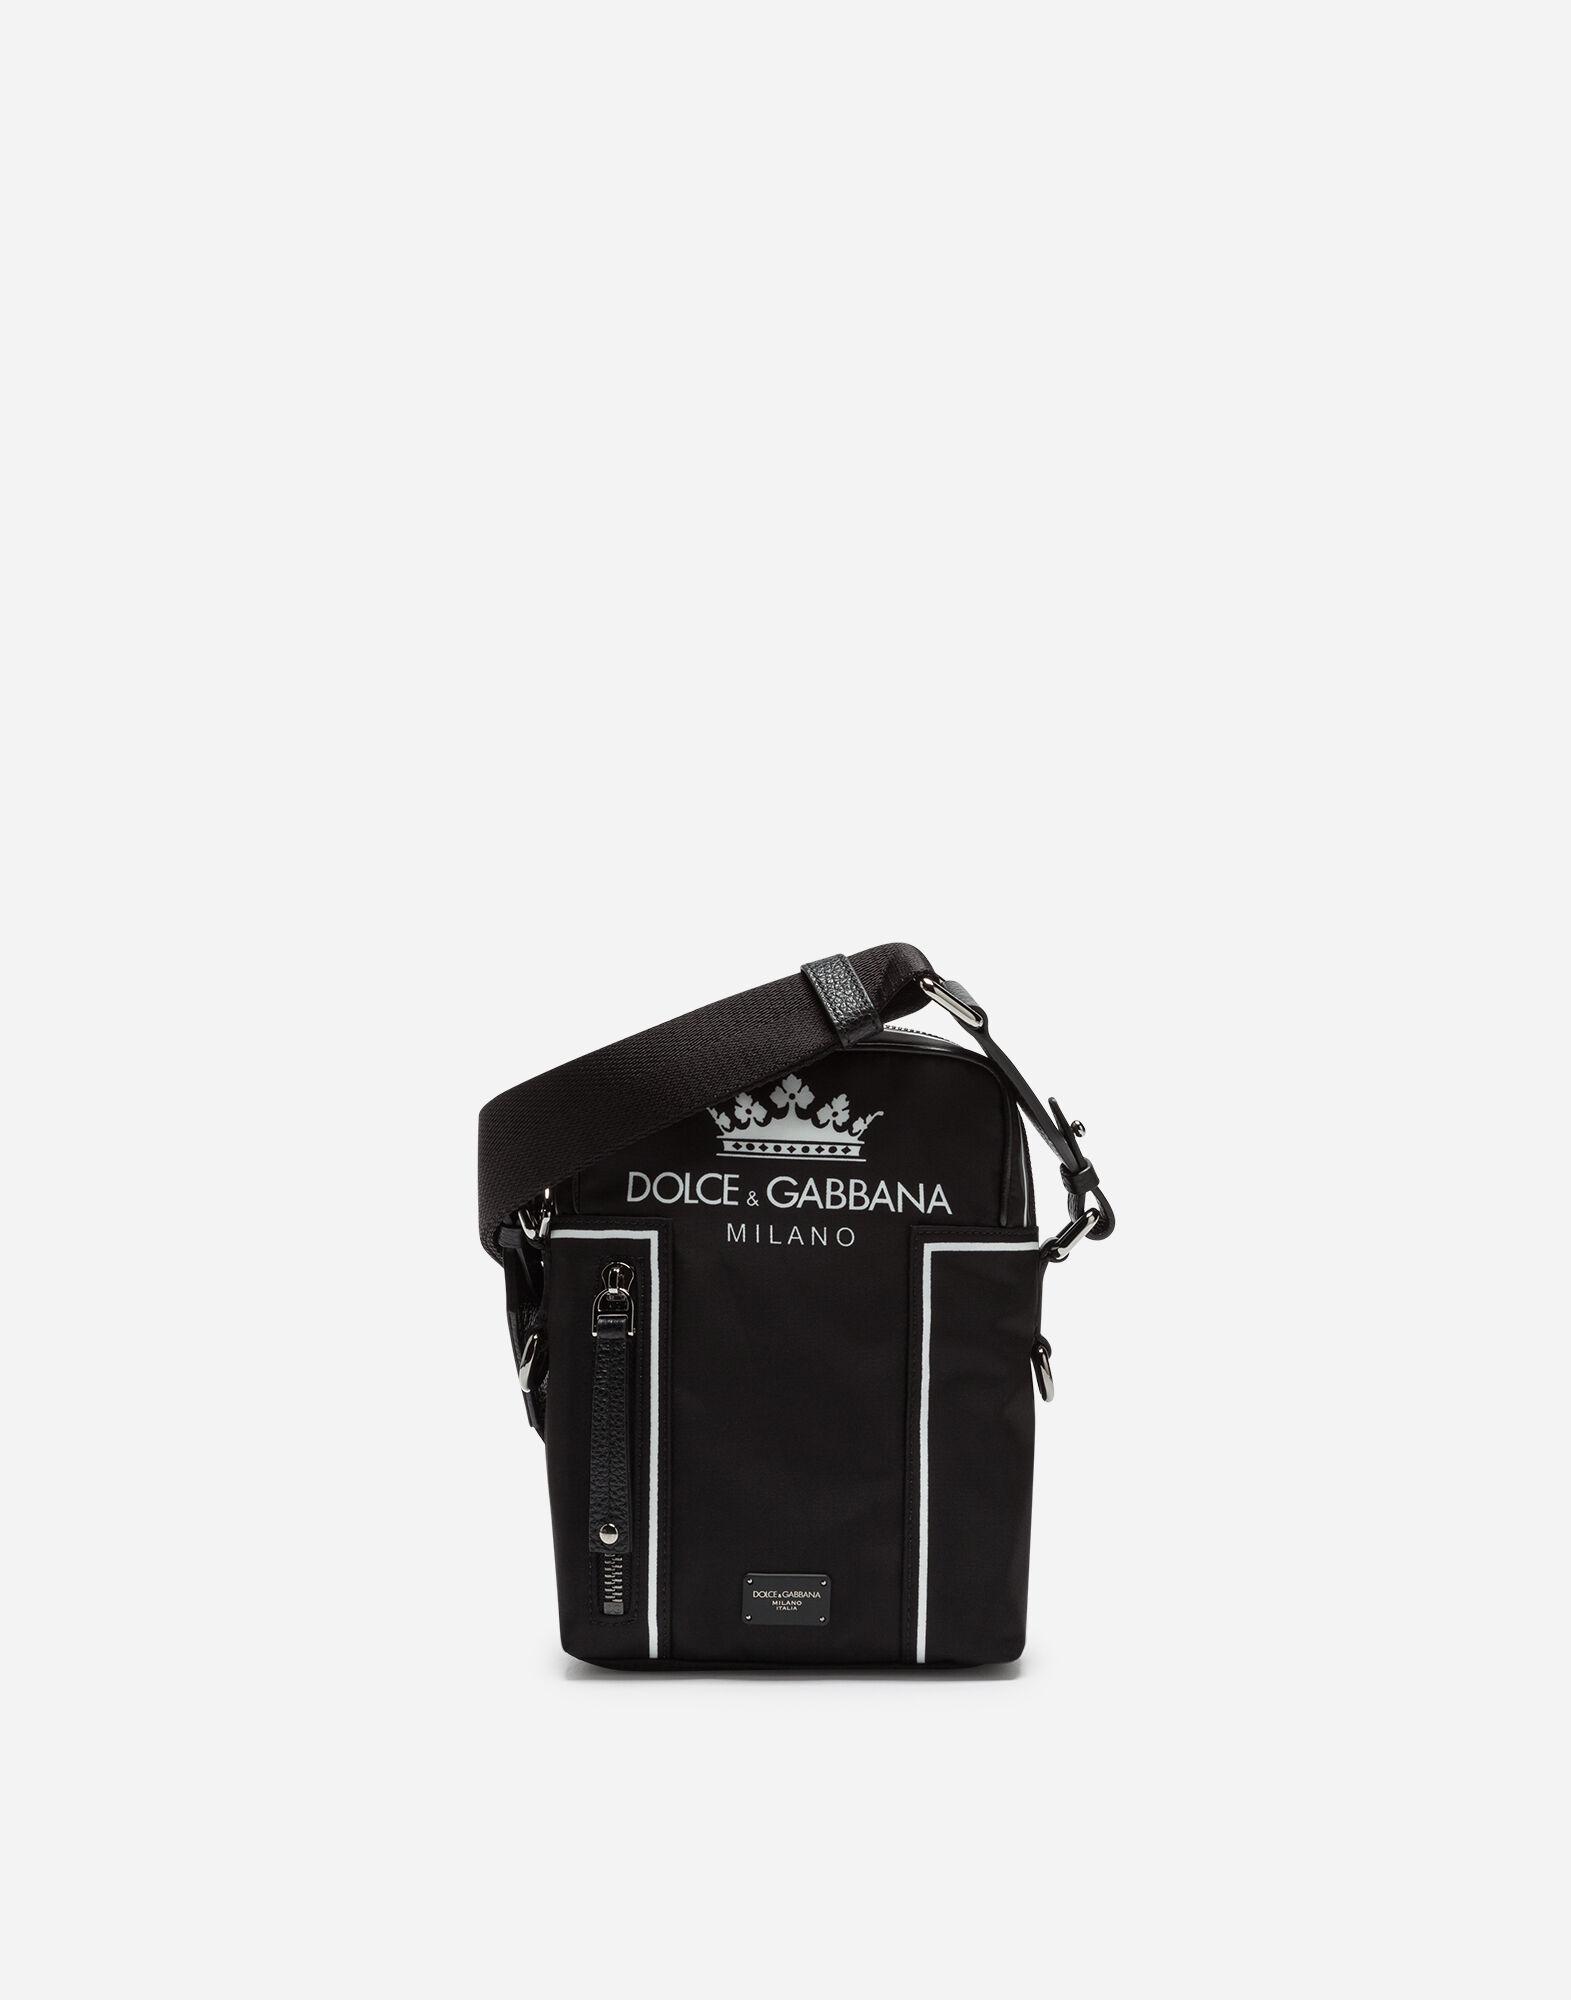 VULCANO SHOULDER BAG IN PRINTED NYLON from DOLCE & GABBANA